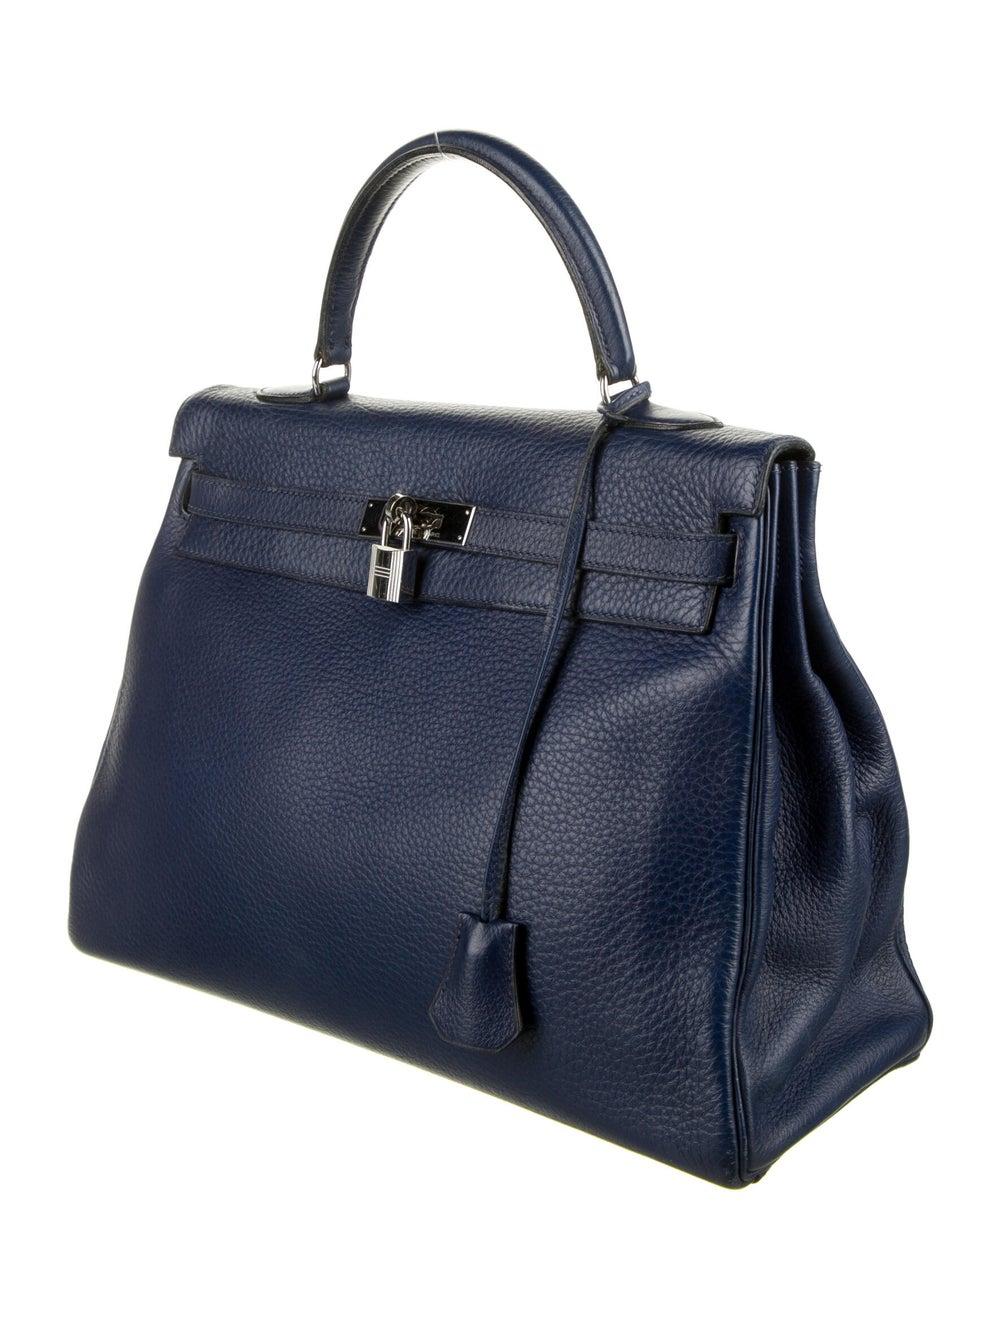 Hermès Vintage Clemence Kelly Retourne 35 Blue - image 3